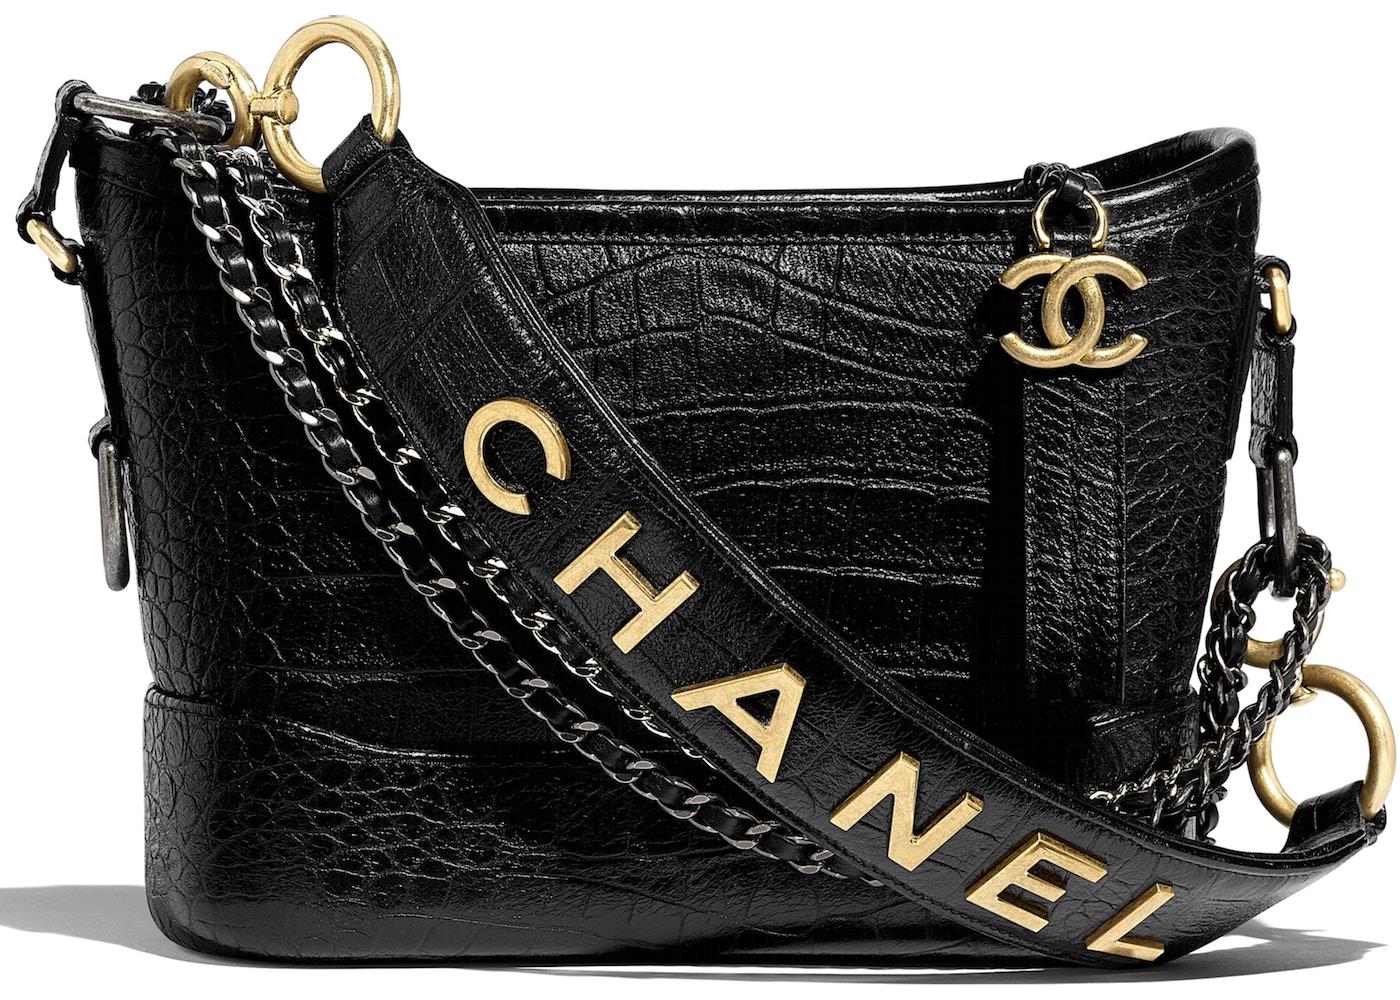 c6b4ea8ea0 Chanel Gabrielle Hobo Bag Crocodile Embossed Calfskin Gold/Silver-tone  Small Black